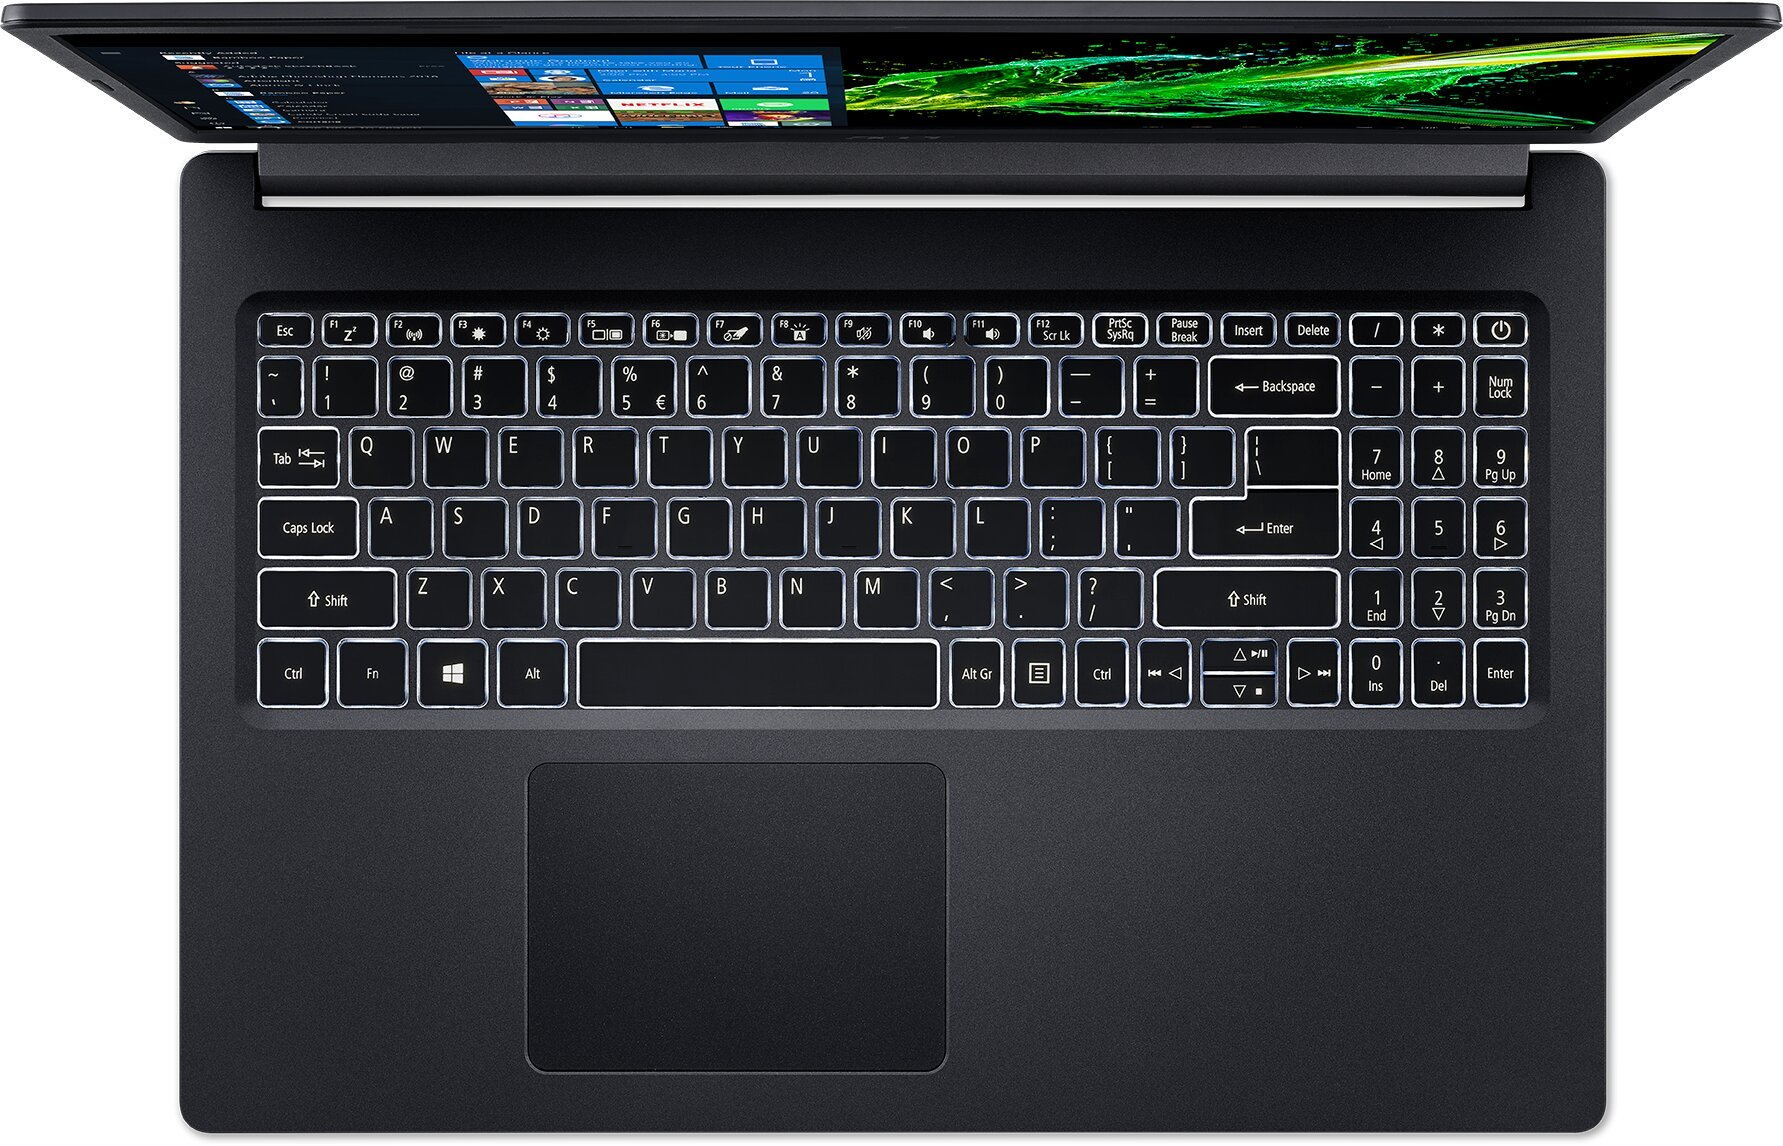 Acer Aspire 5 A515-54G-72Z7